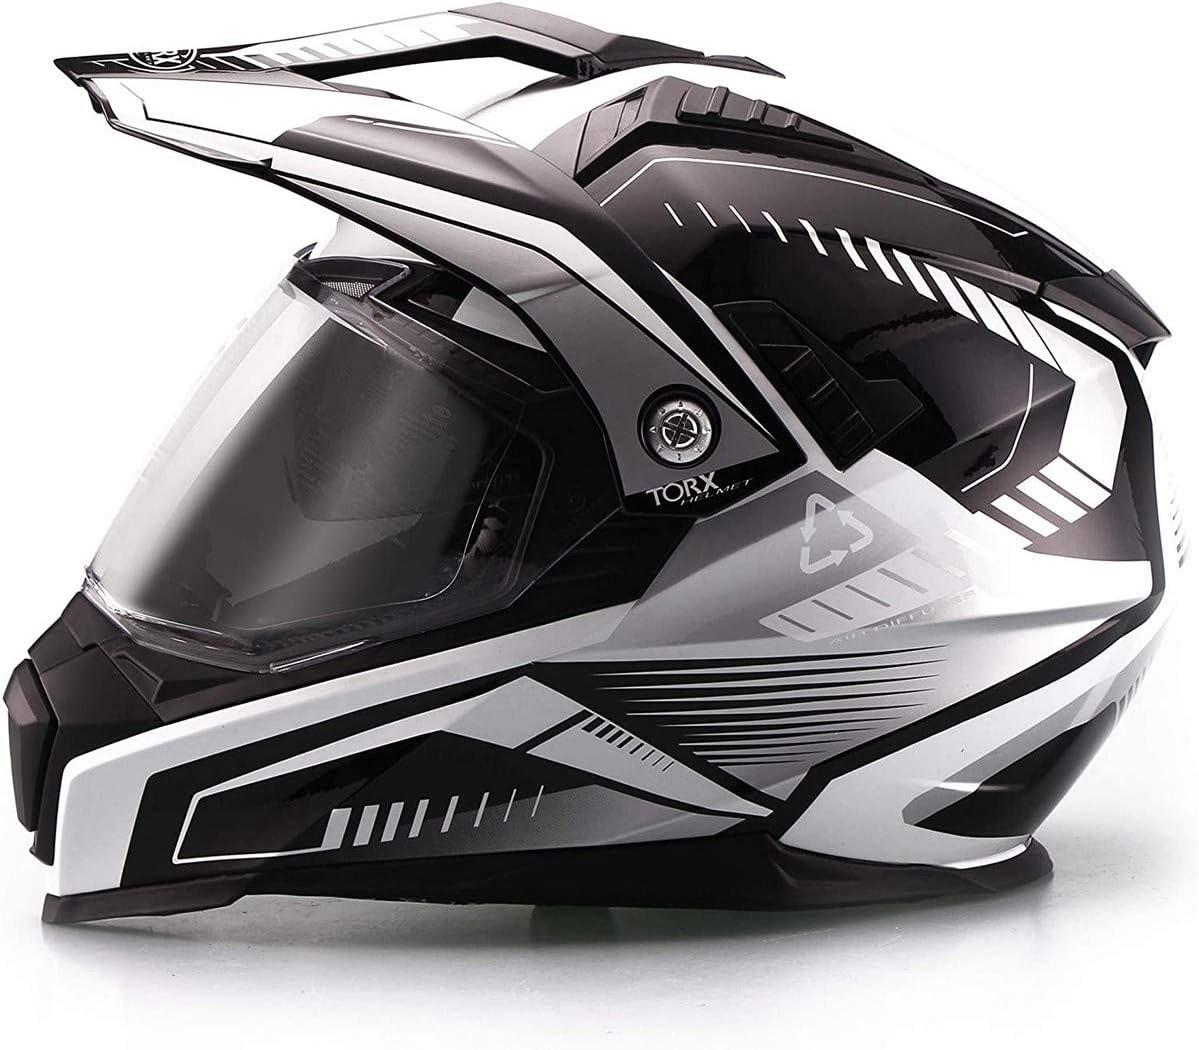 Jaune Taille XS TORX Casque Tourer Moto DUNDEE V